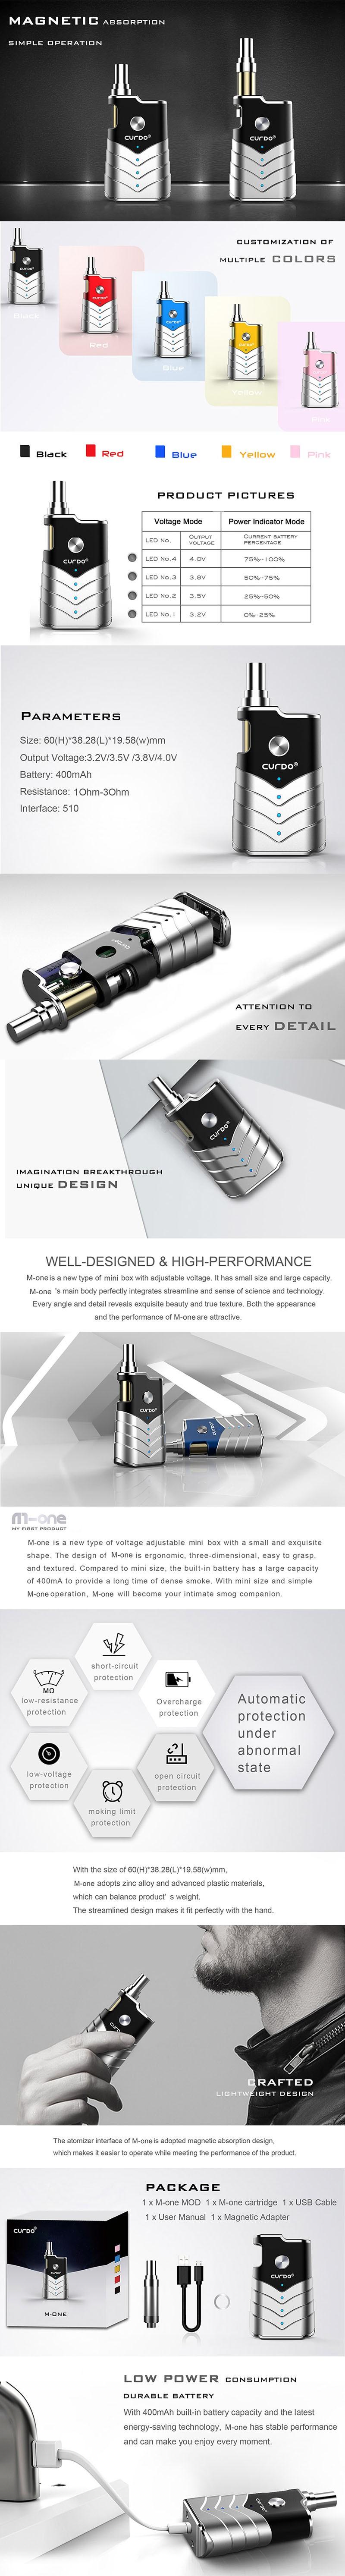 Curdo M-One 400mAh Box Mod w/ M-One Atomizer Starter Kit